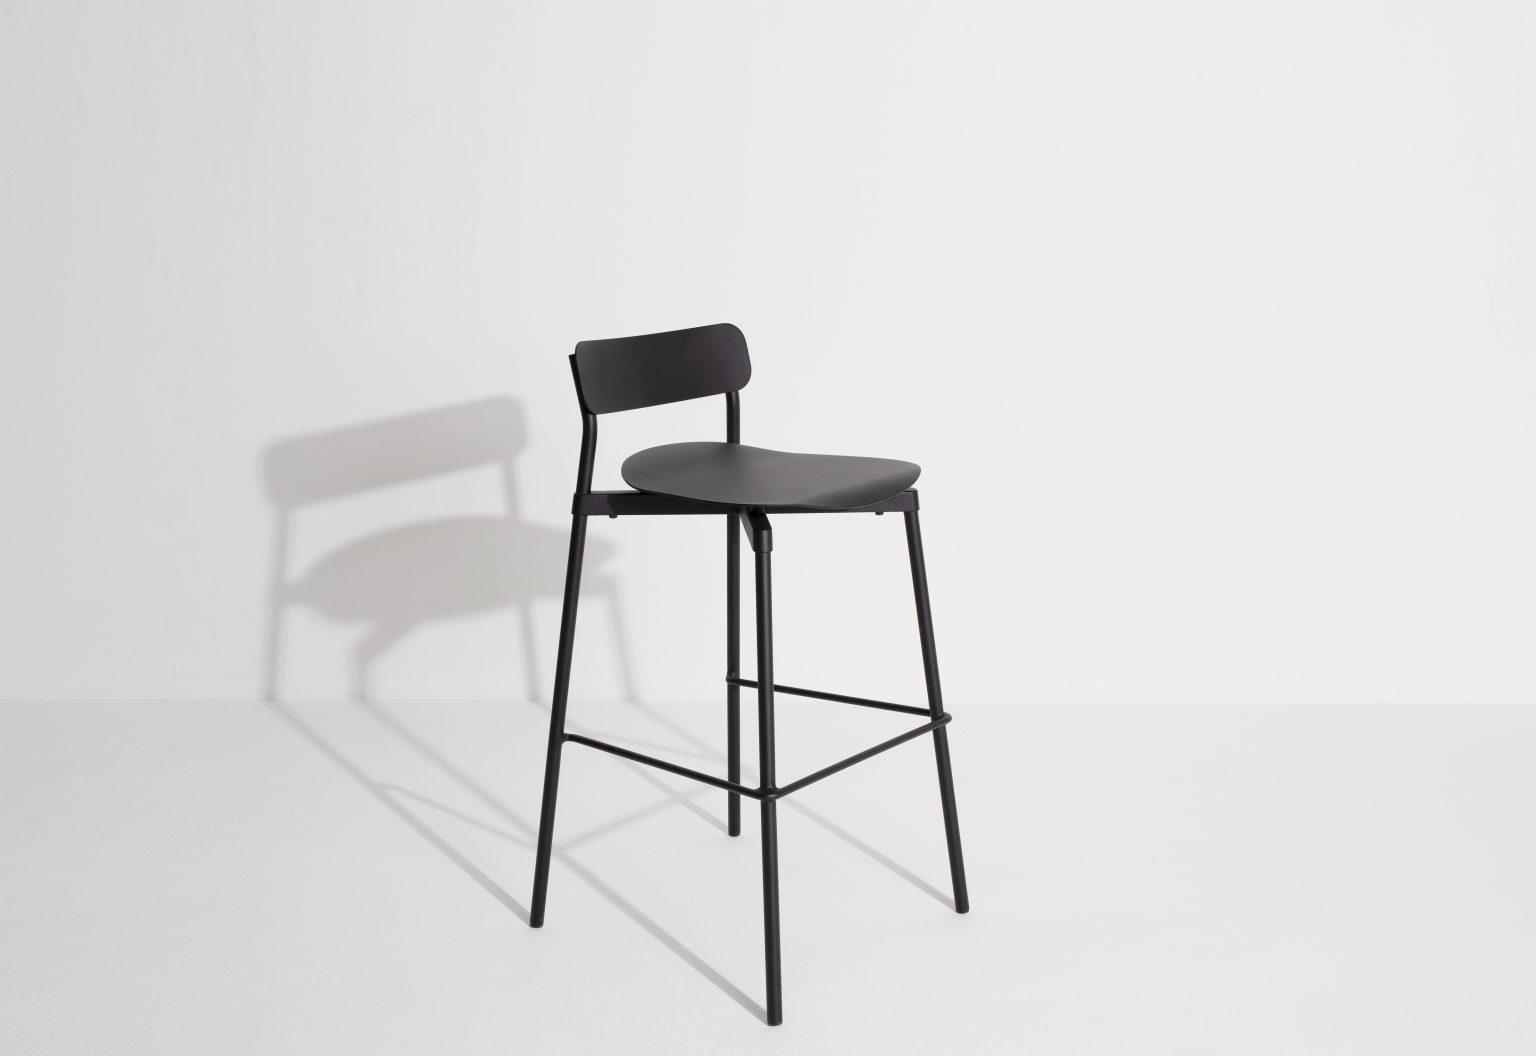 Biennale Interieur - Belgium's leading design and interior event - M0810401_fromme_bar_stool_black_©pf_packshot_hd-2.jpg